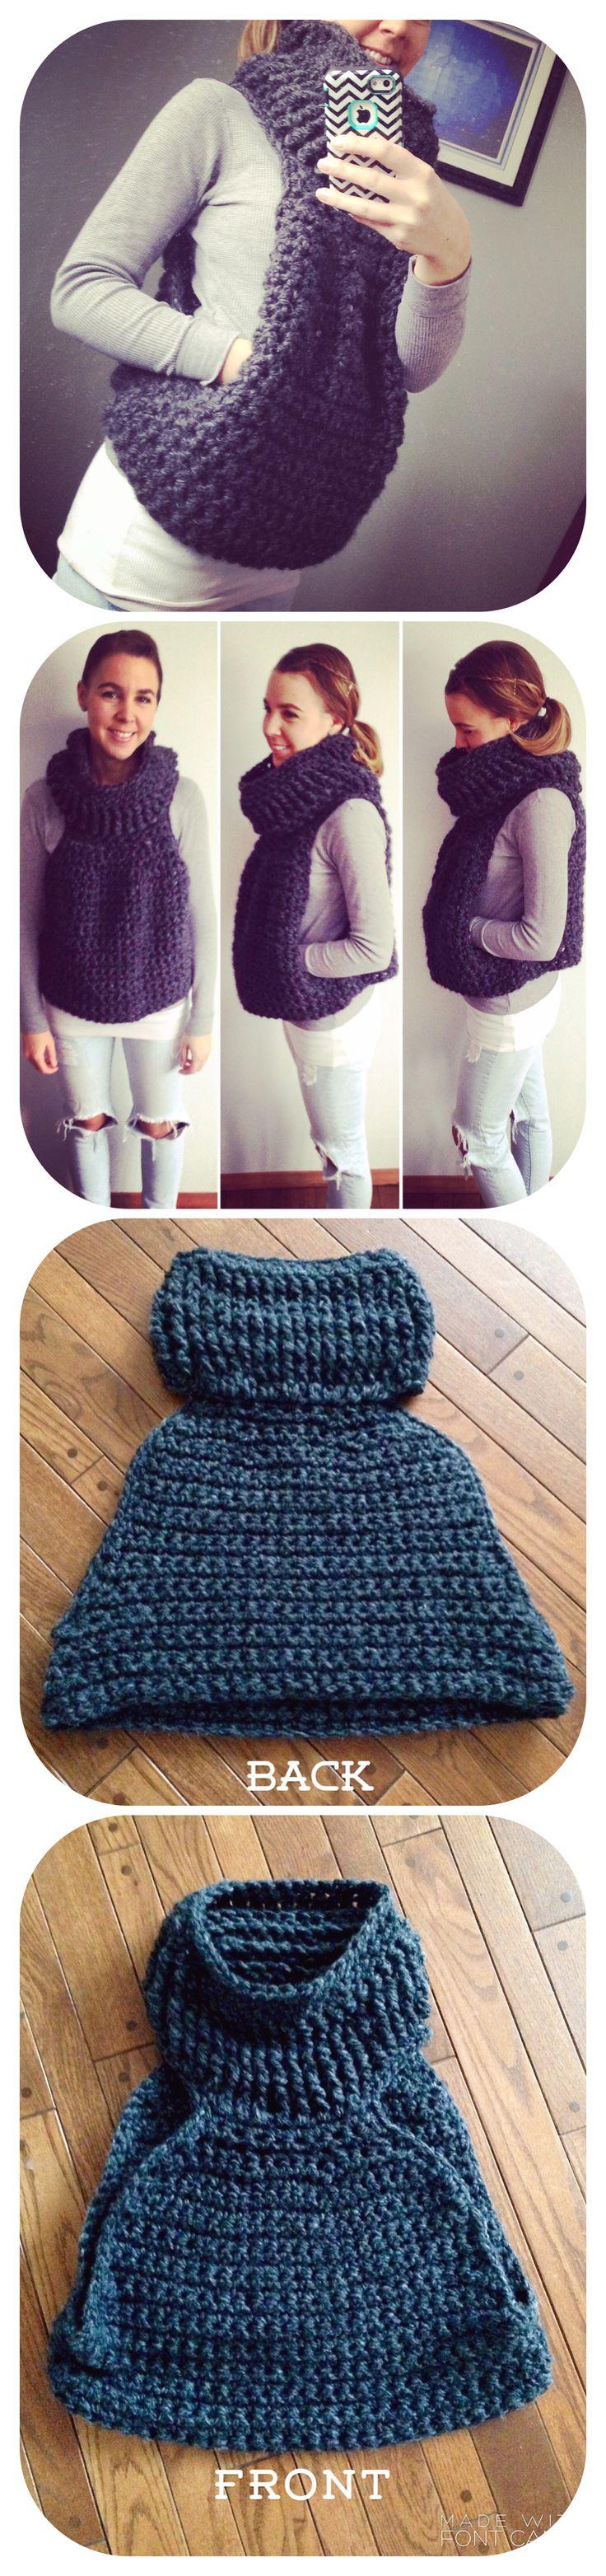 Miner's vest, chunky cowl neck vest,crochet vest,cozy outfit,cozy attire